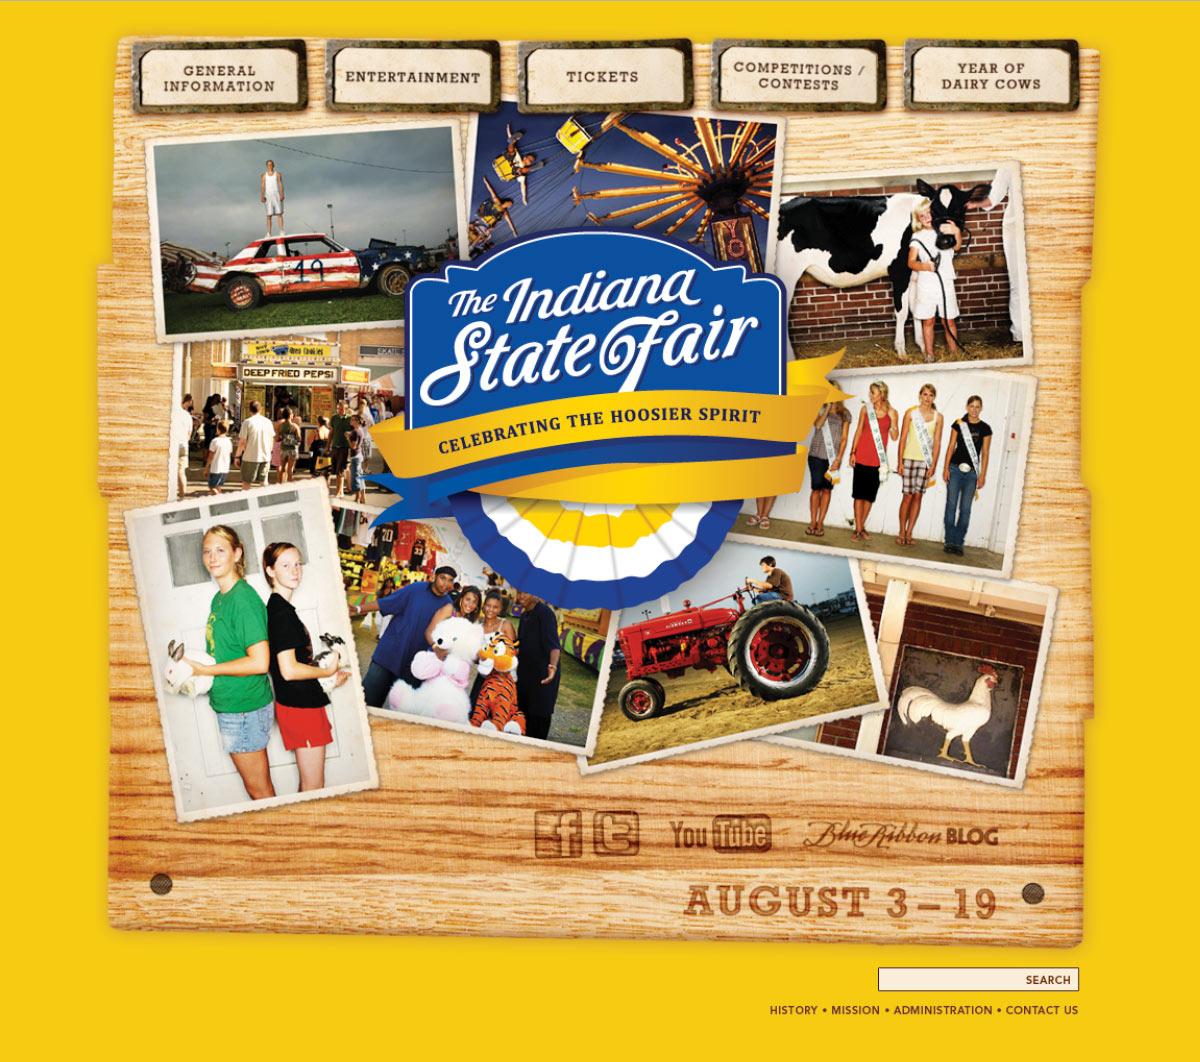 Indiana State Fair: 2012 Website